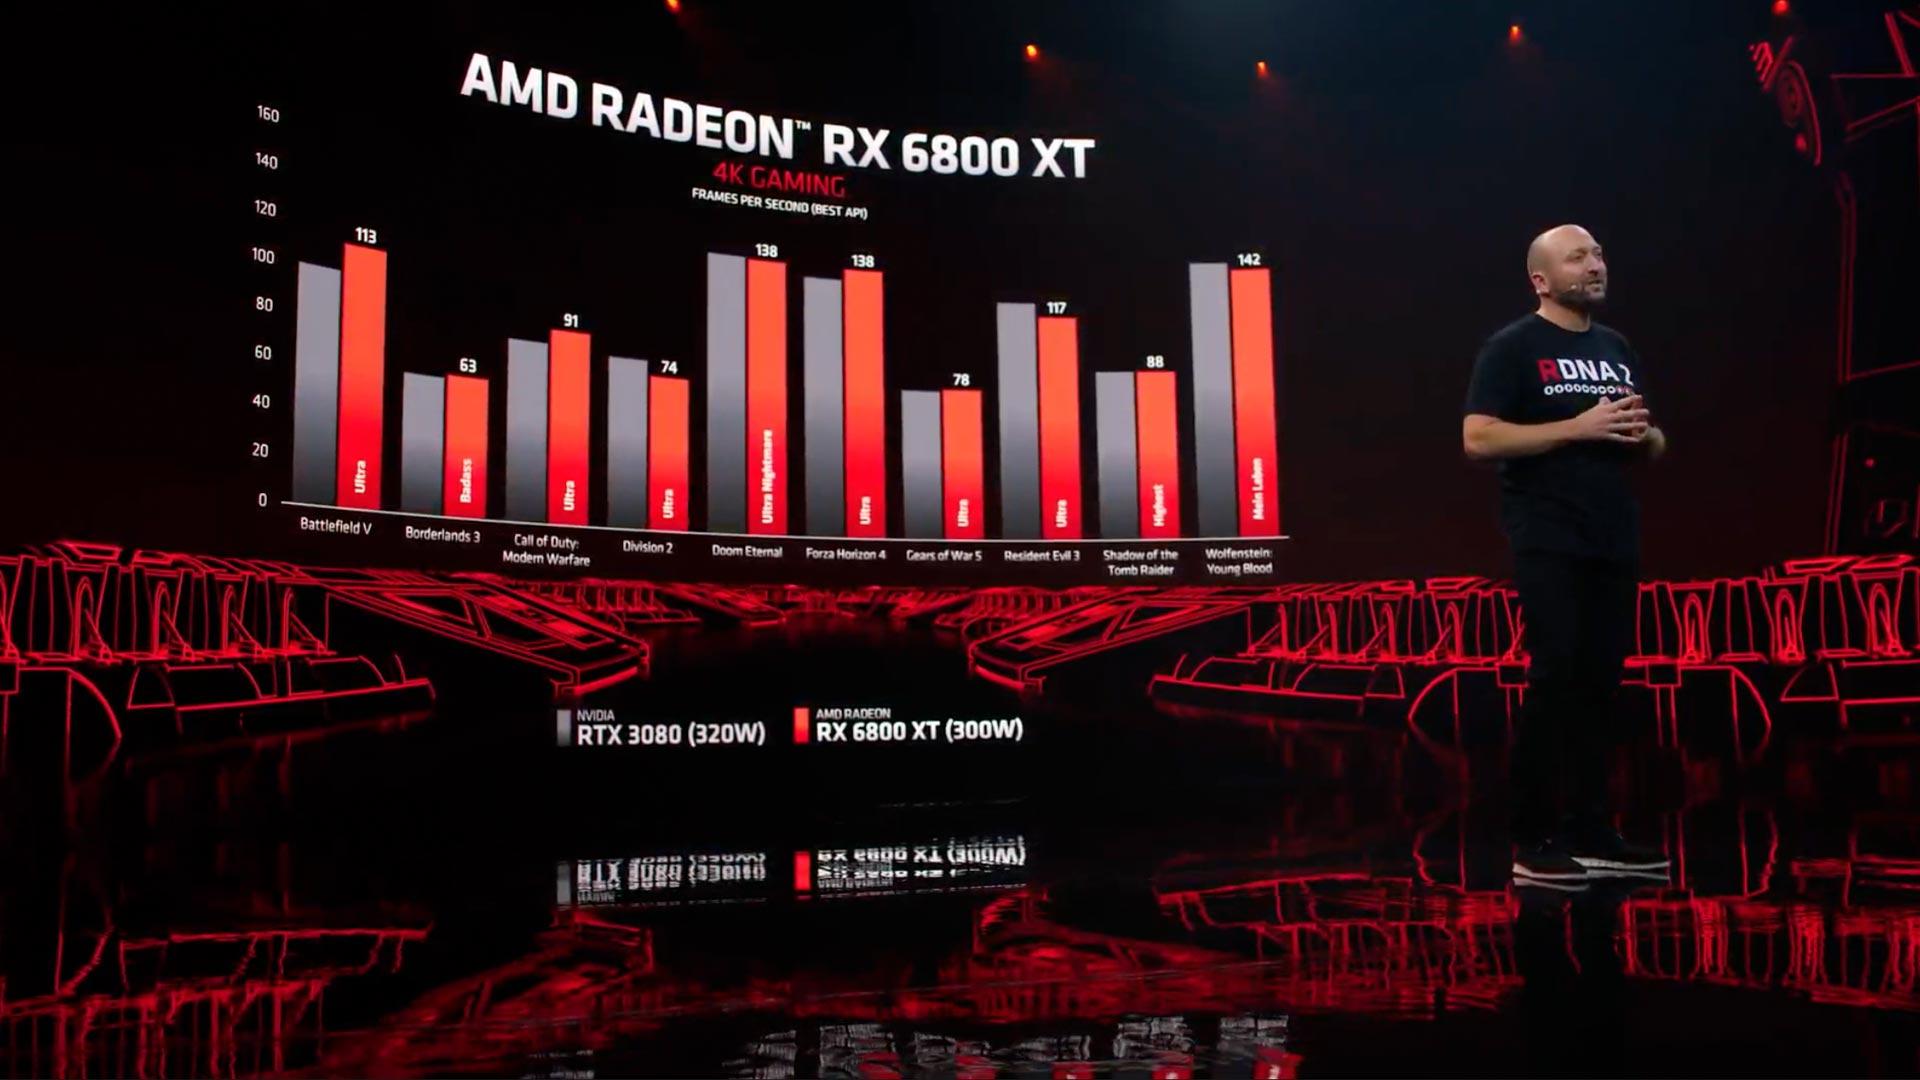 amd rdna 2 radeon rx 6800xt